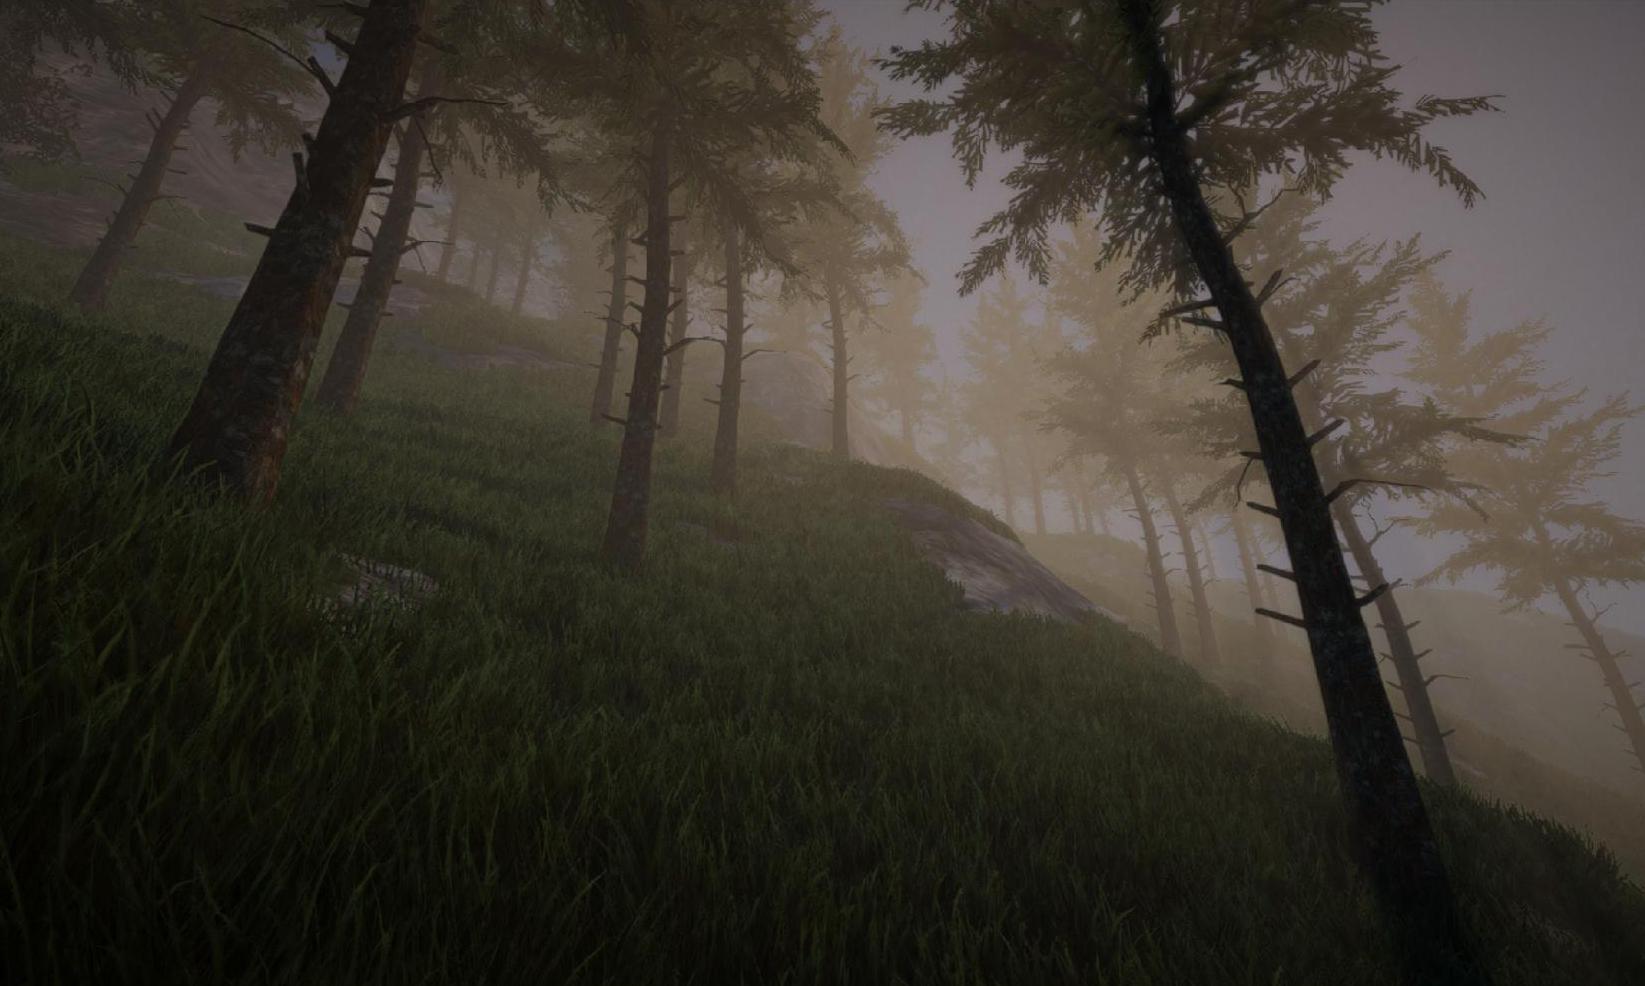 terrain2.jpg